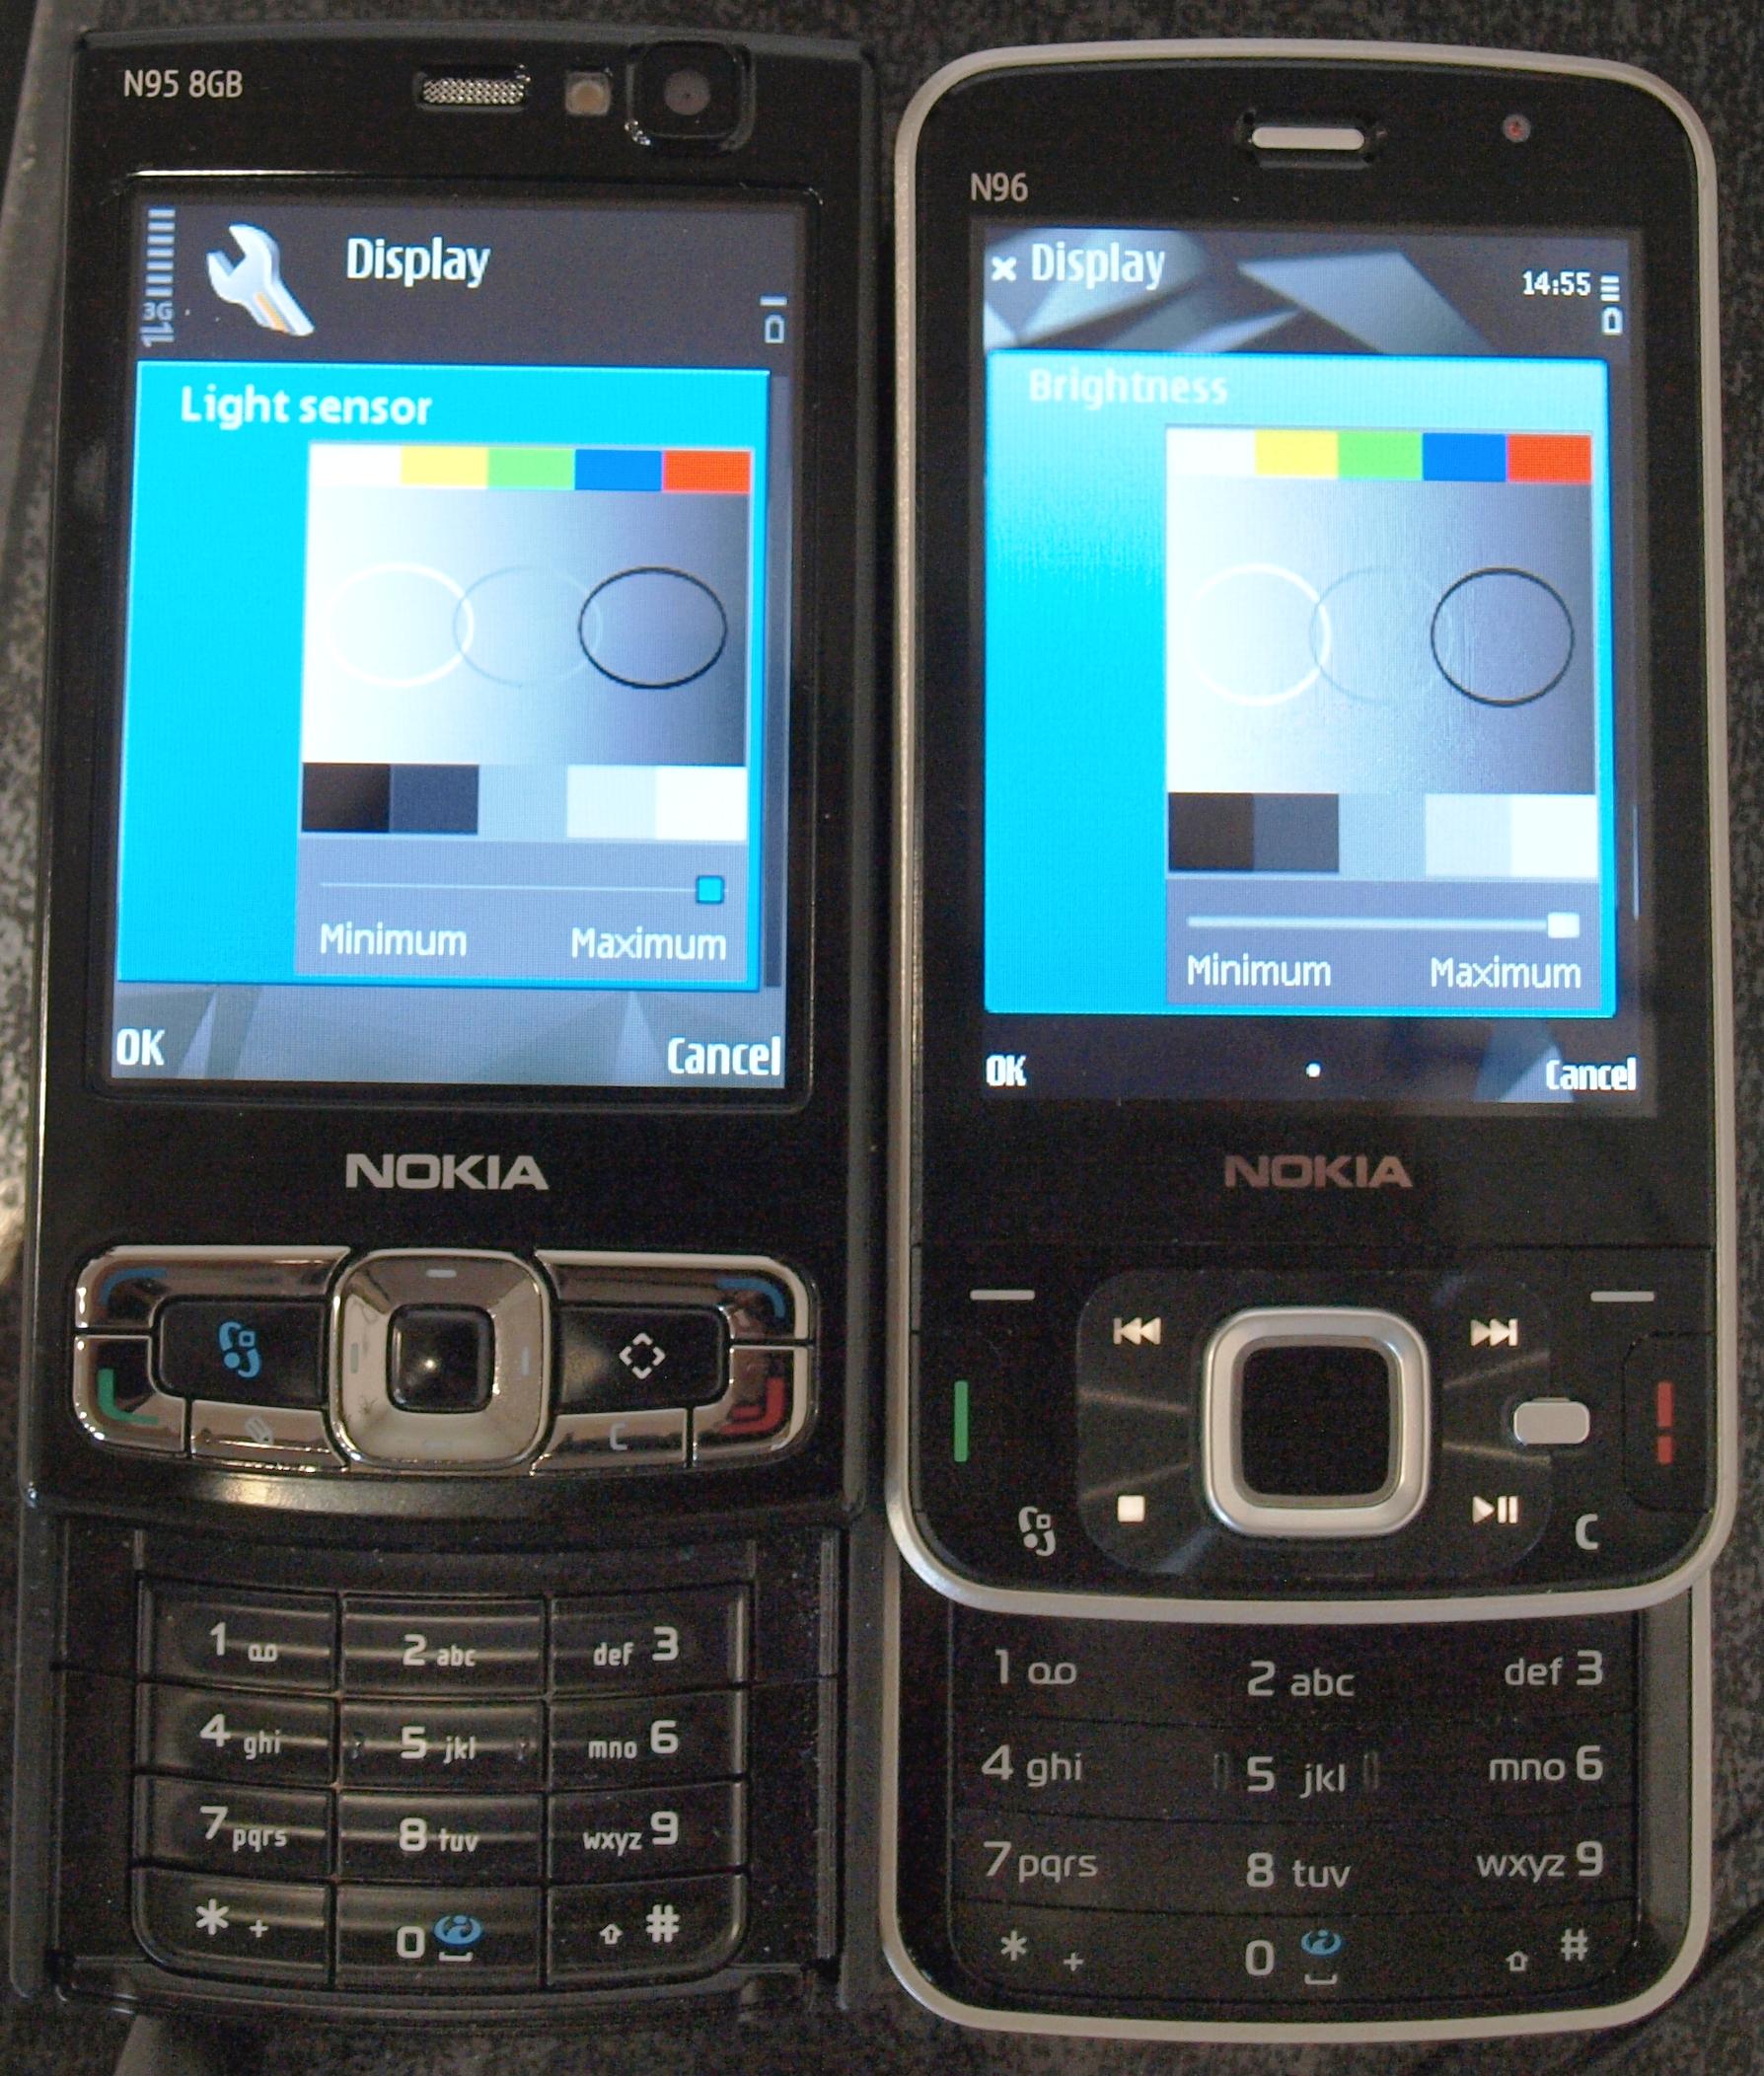 1788 x 2104 jpeg 2507kB, Nokia n96 preliminary review size comparison ...